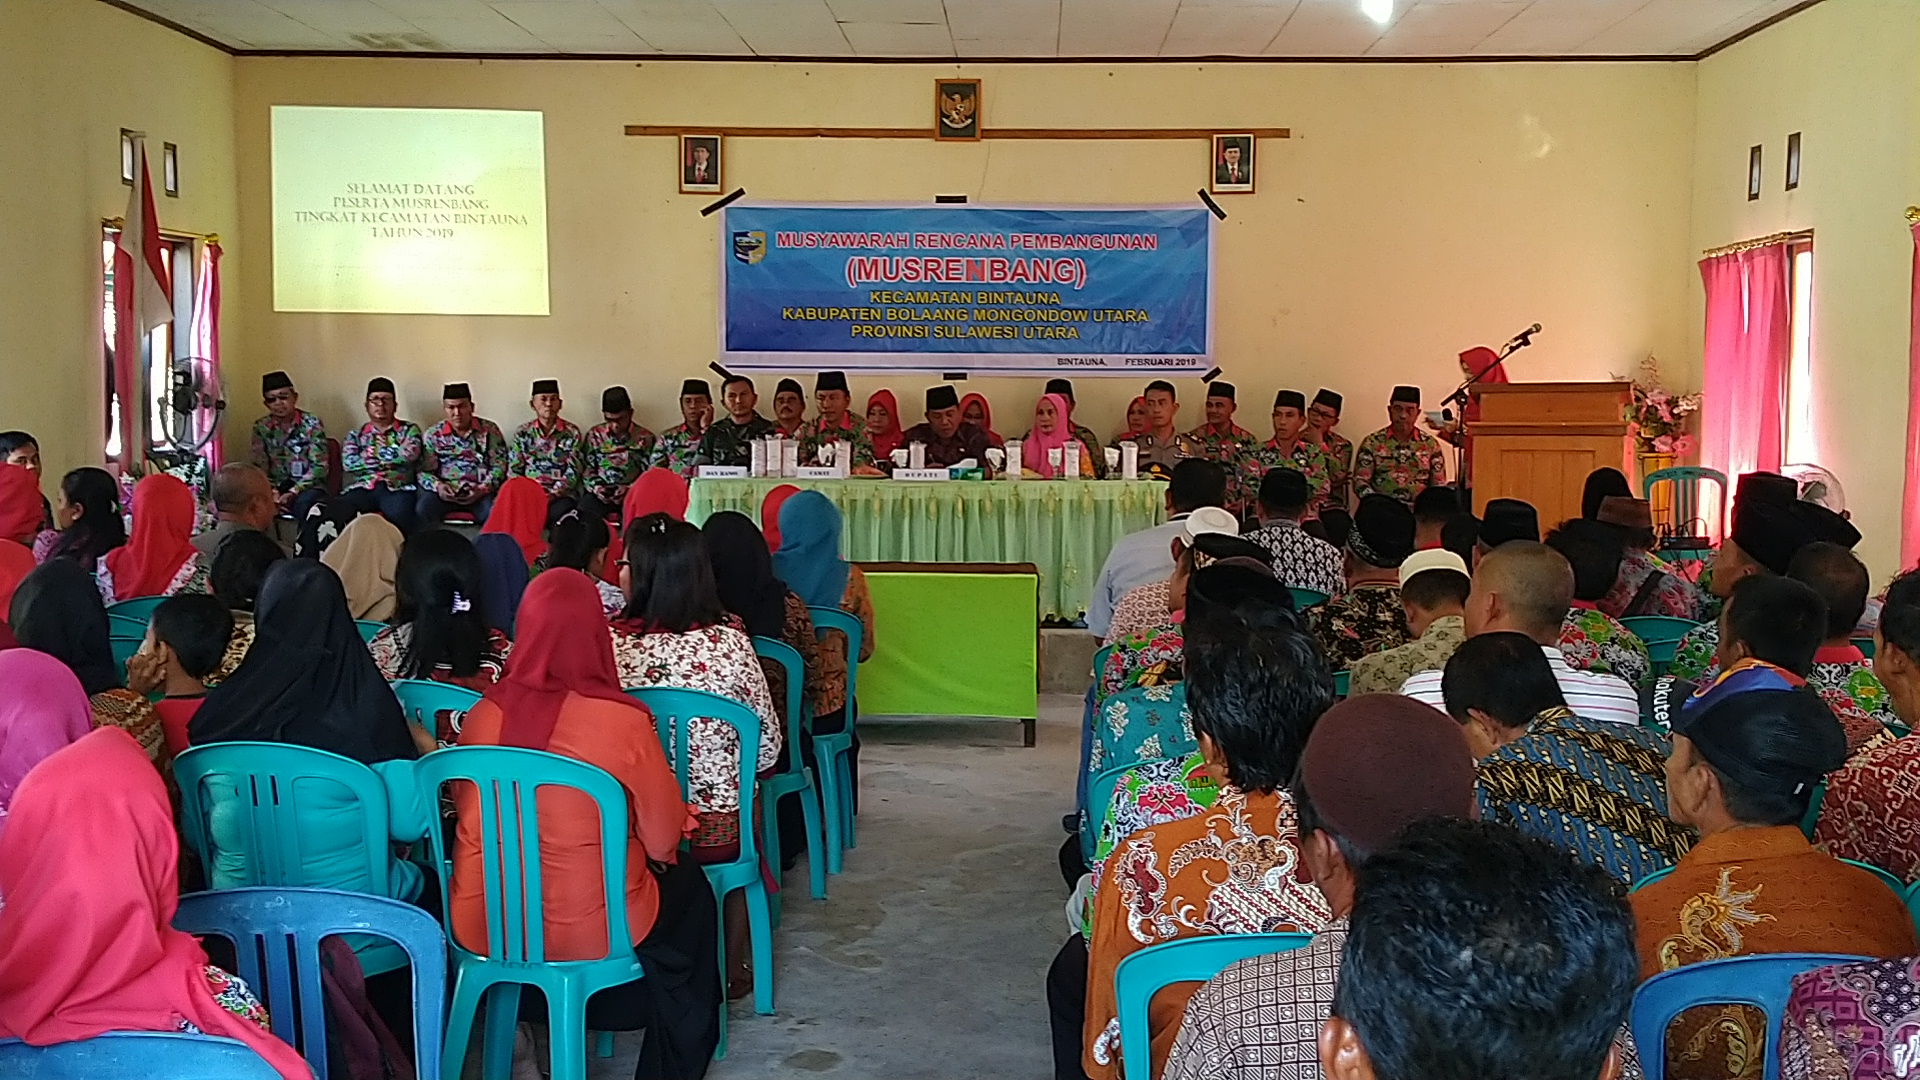 Bupati Dorong Antusiasme Masyarakat Dalam Musrenbang Kecamatan